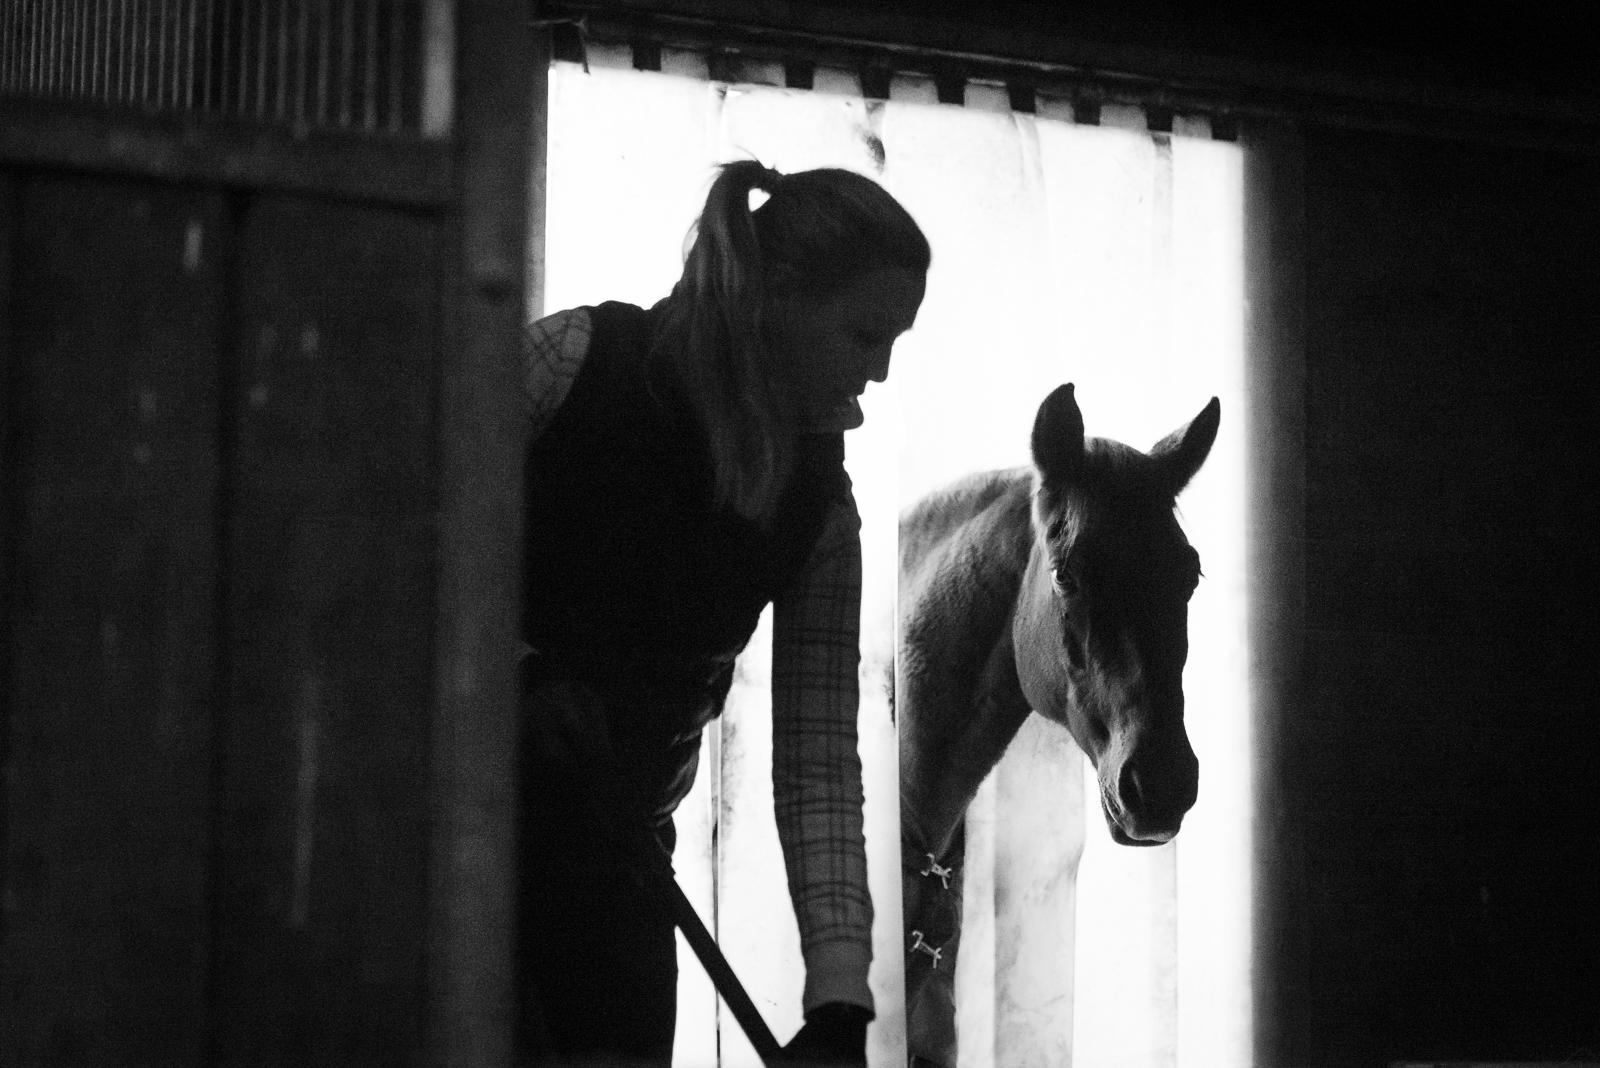 Authentische Pferdefotografie | Eschuleo Box Misten | Sarah Koutnik Fotografie | München Krailling | Portfolio